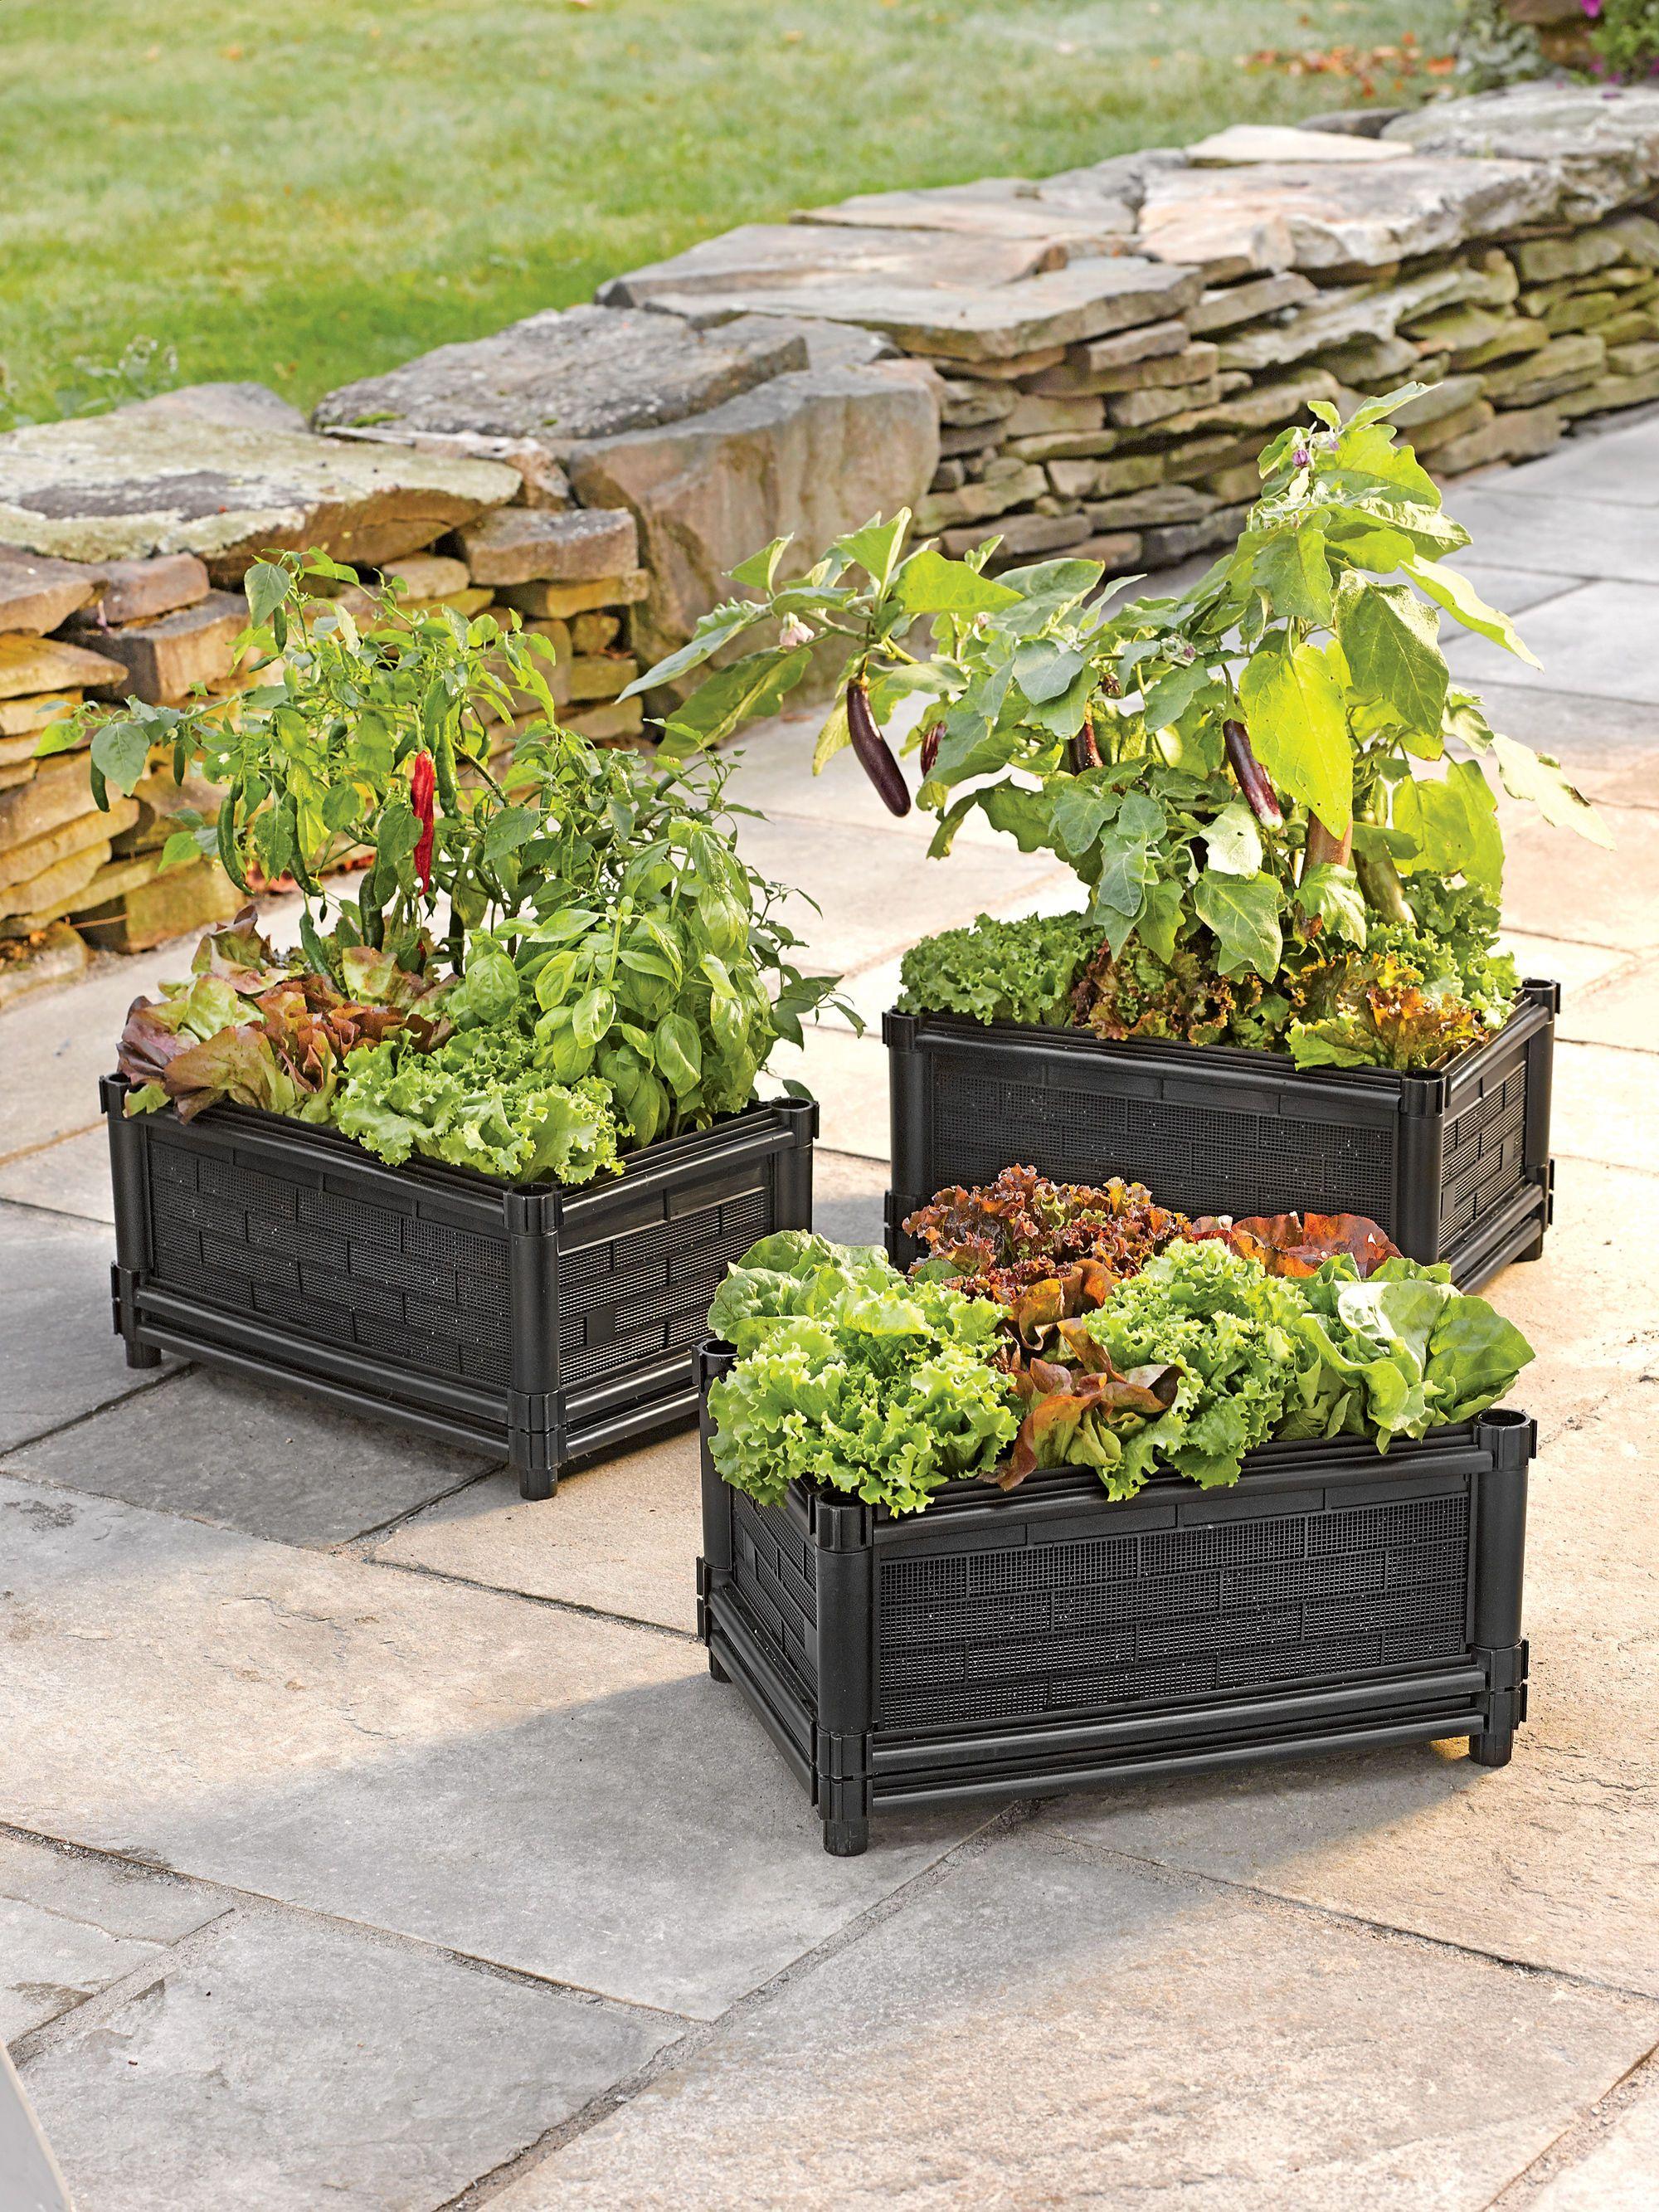 Veg Grow Box For Balcony, Stoop Or Patio Gardening | Gardeners Supply